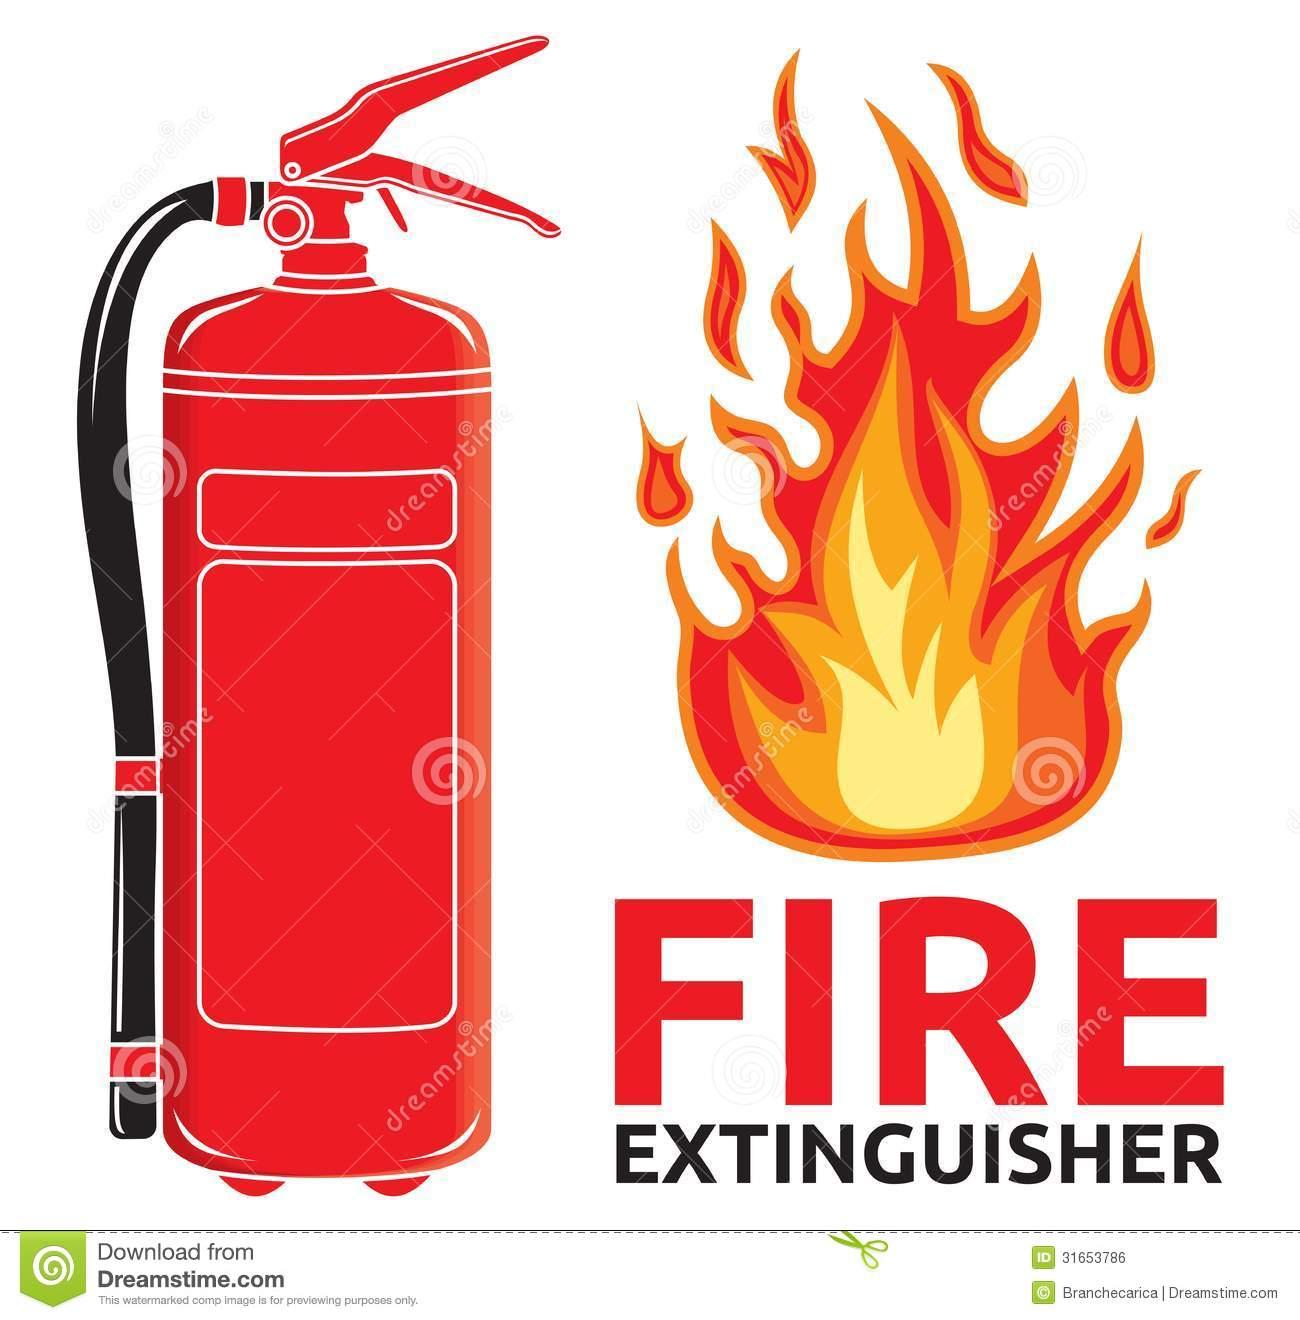 Fire Extinguisher Animation.